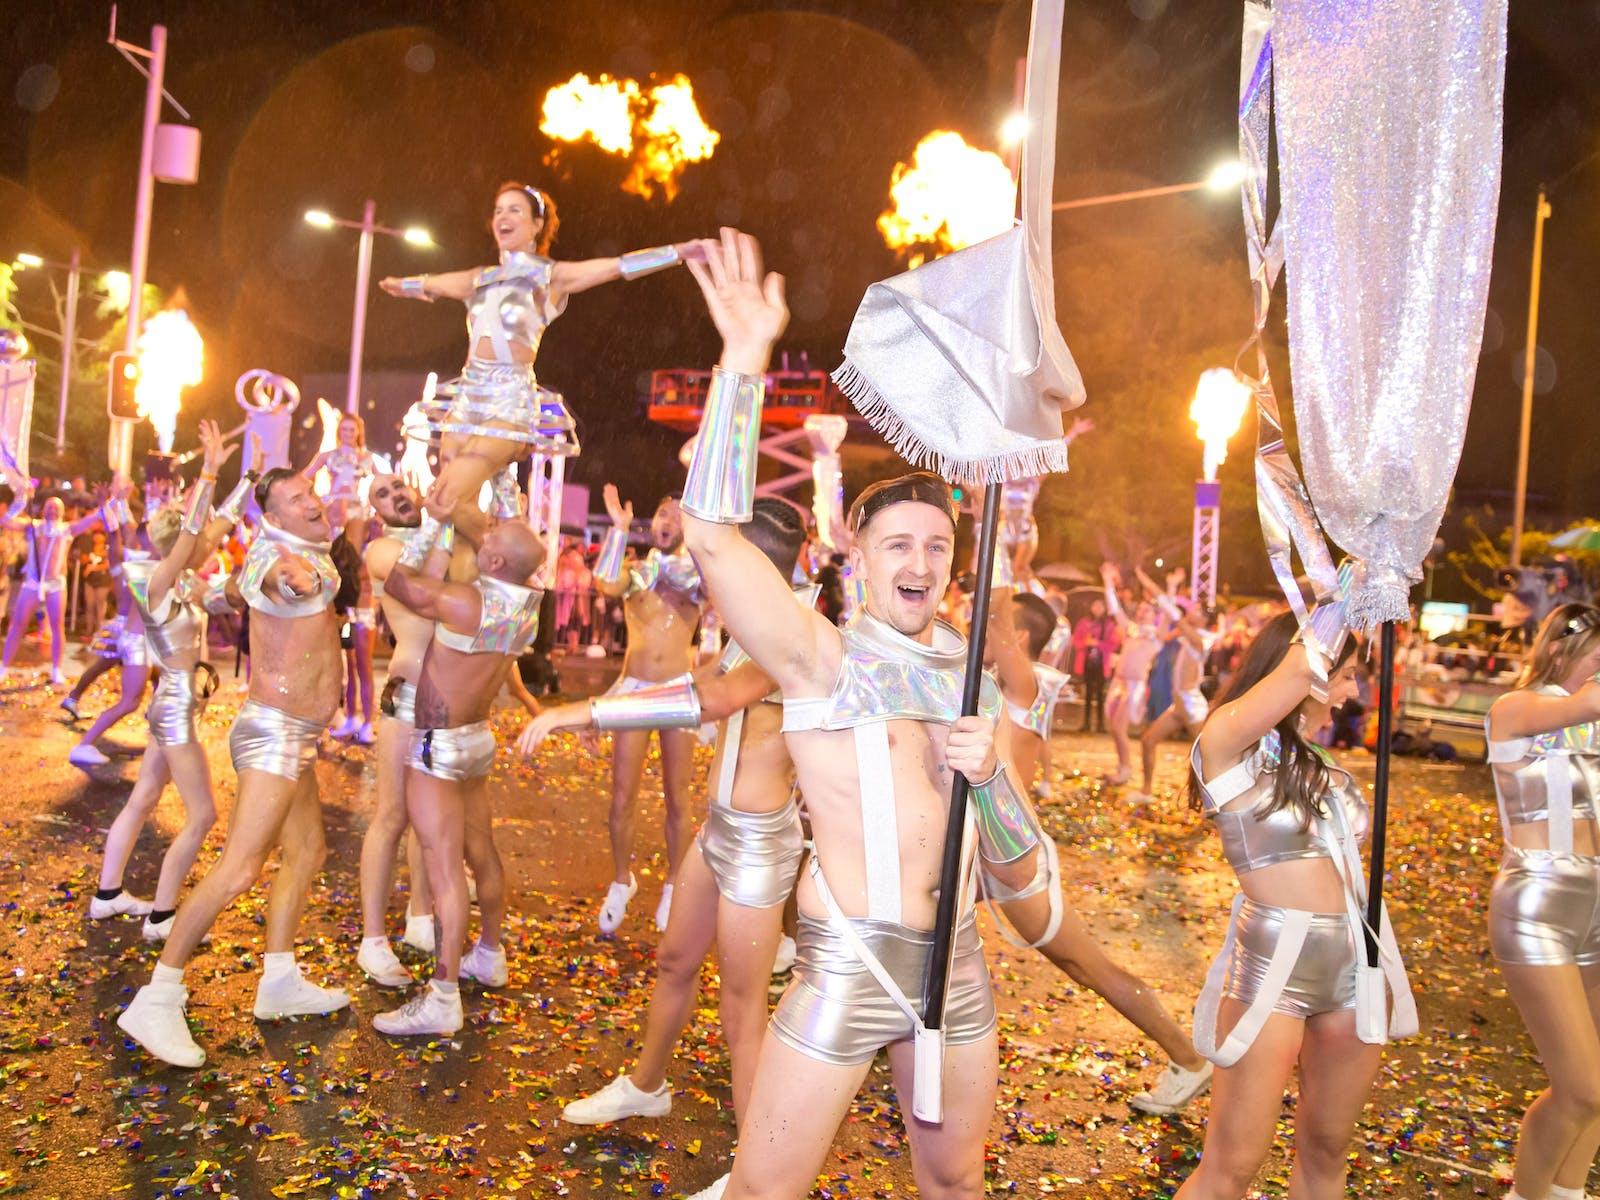 Image for Sydney Gay and Lesbian Mardi Gras